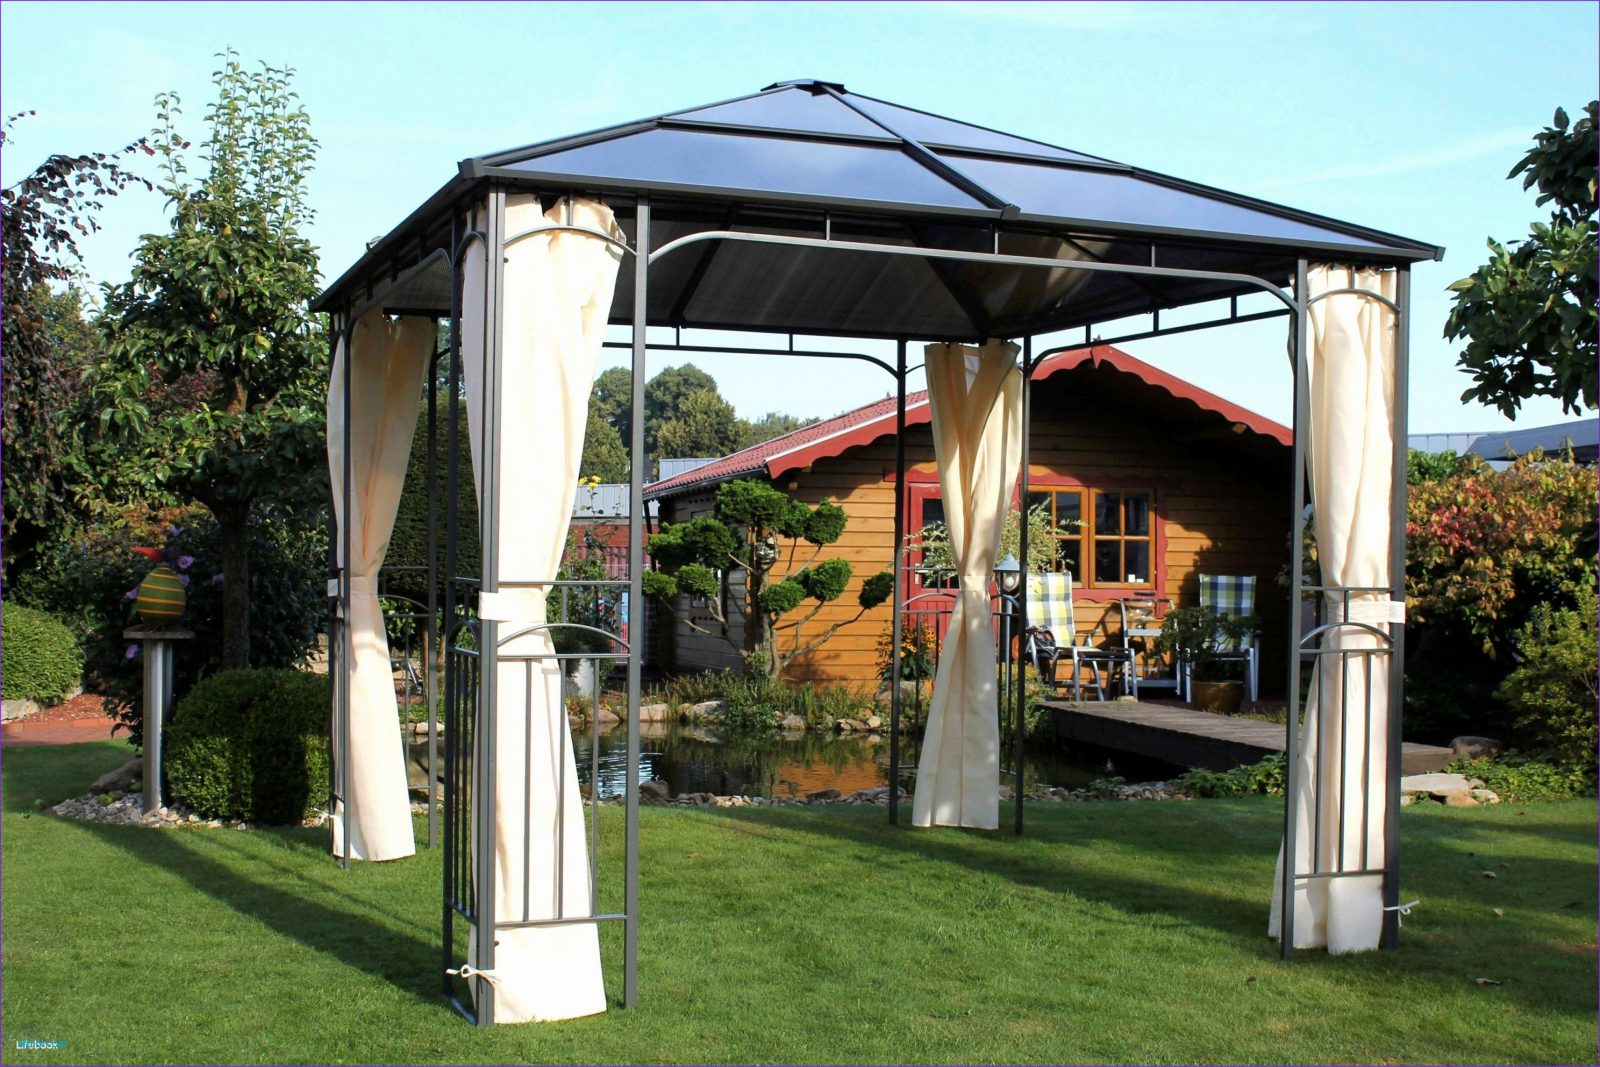 Pavillon 3X3 Wasserdicht Stabil Für Pavillon 3X4M Wasserdicht von Pavillon Metall 3X3 Wasserdicht Bild